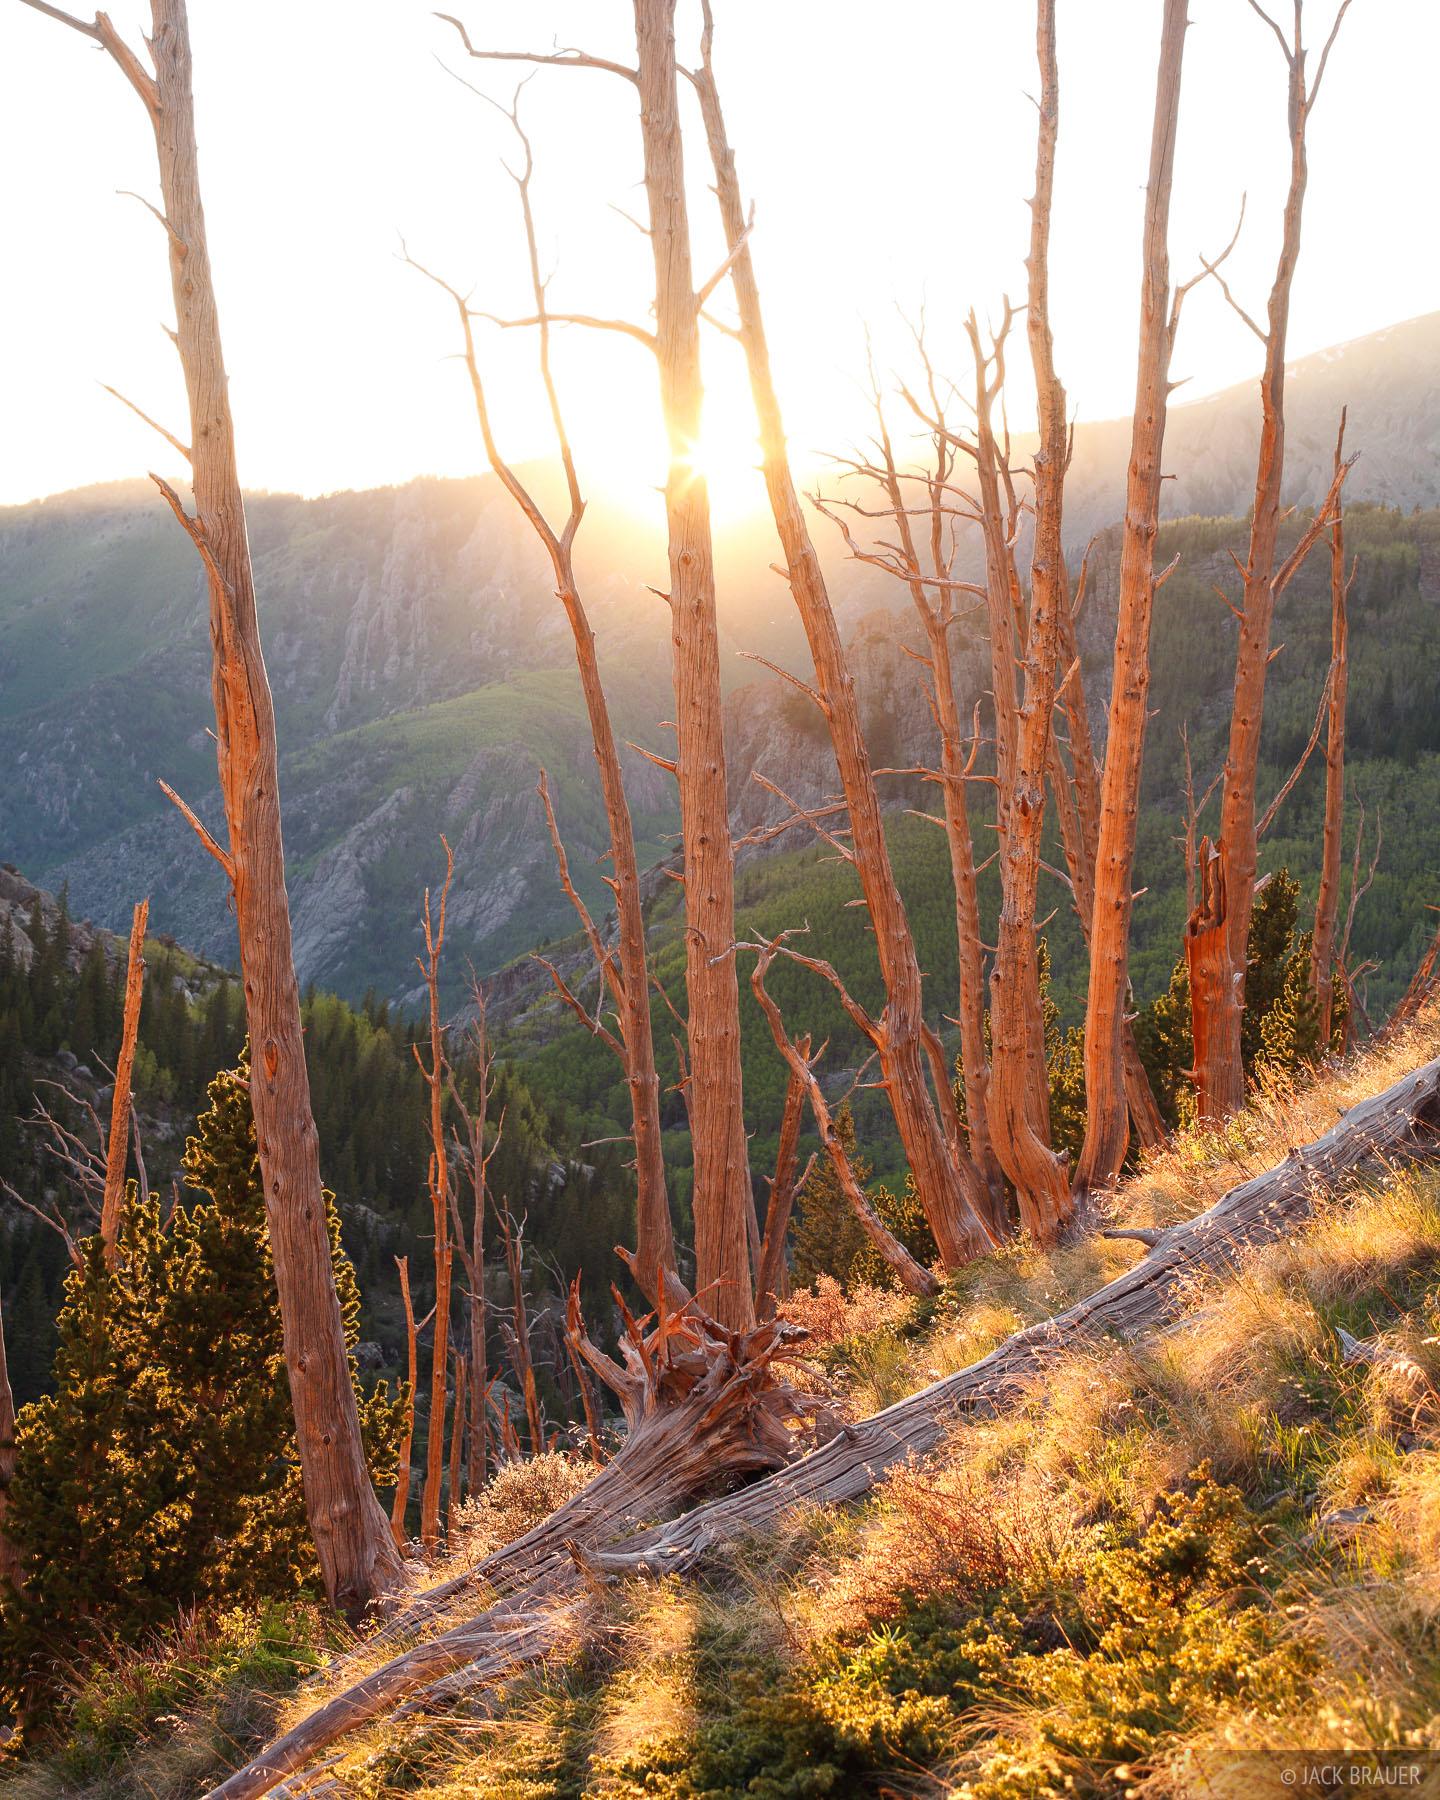 Sangre de Cristo, Colorado, North Crestone, sunset, June, Sangre de Cristo Wilderness, photo